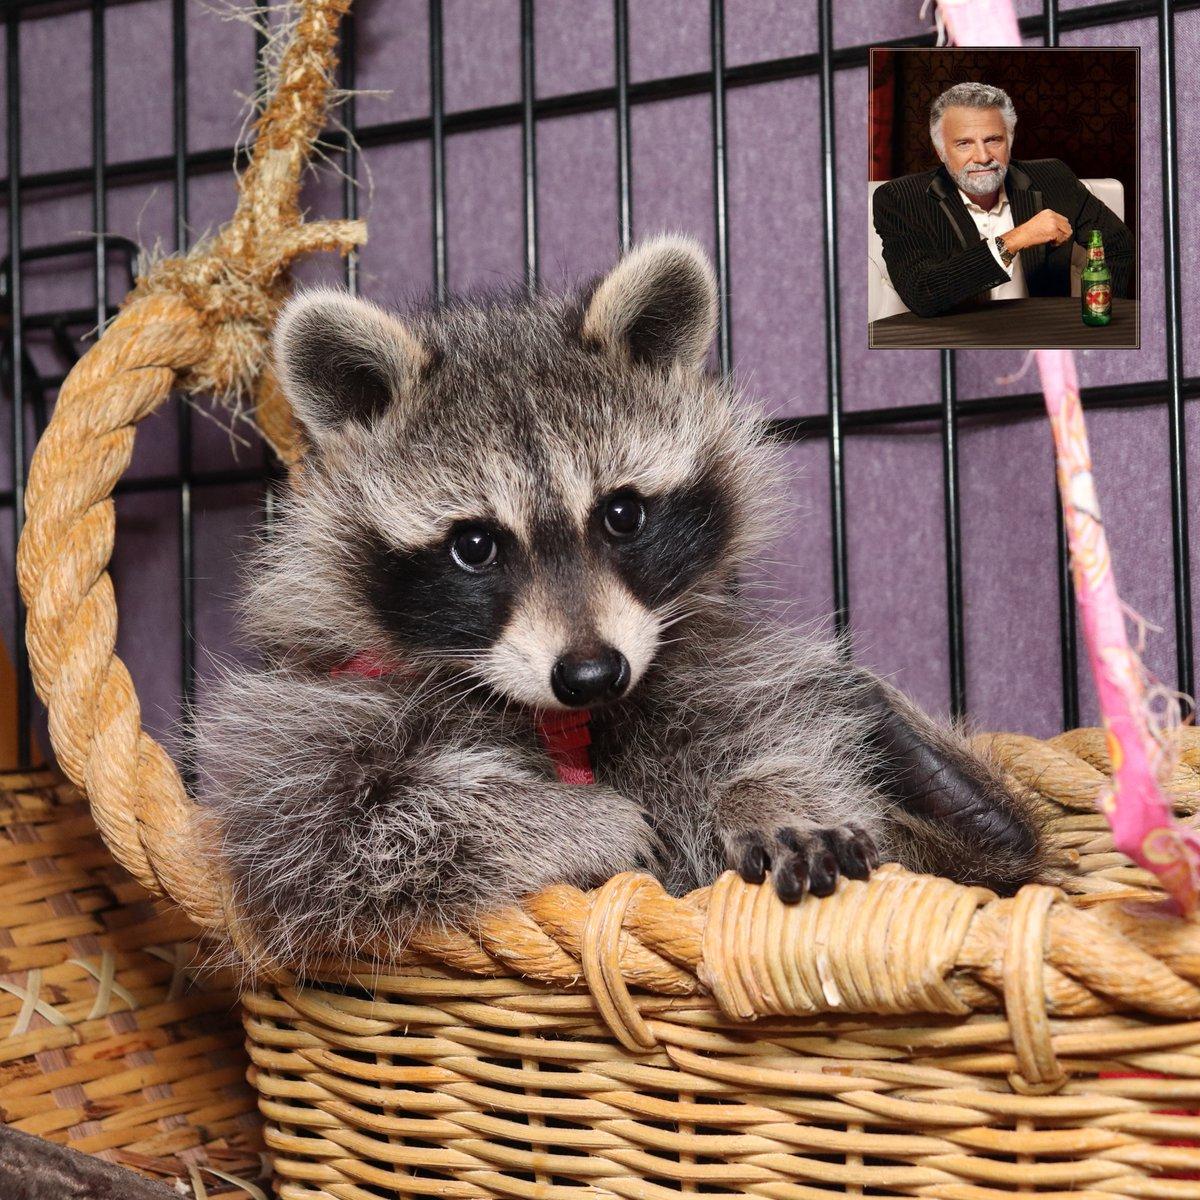 I don't always eat garbage, but when I do...  #raccoon #babyraccoon #babywildlife #WildlifeWednesday #babyanimals #cutebabyanimals #cuteanimals #cutepets #raccoonlife #petraccoon #rocketraccoon #forbiddencatto #chonk #CutenessOverload #cute #urbanwildlife #wildlifephotography https://t.co/hnbA731UTl